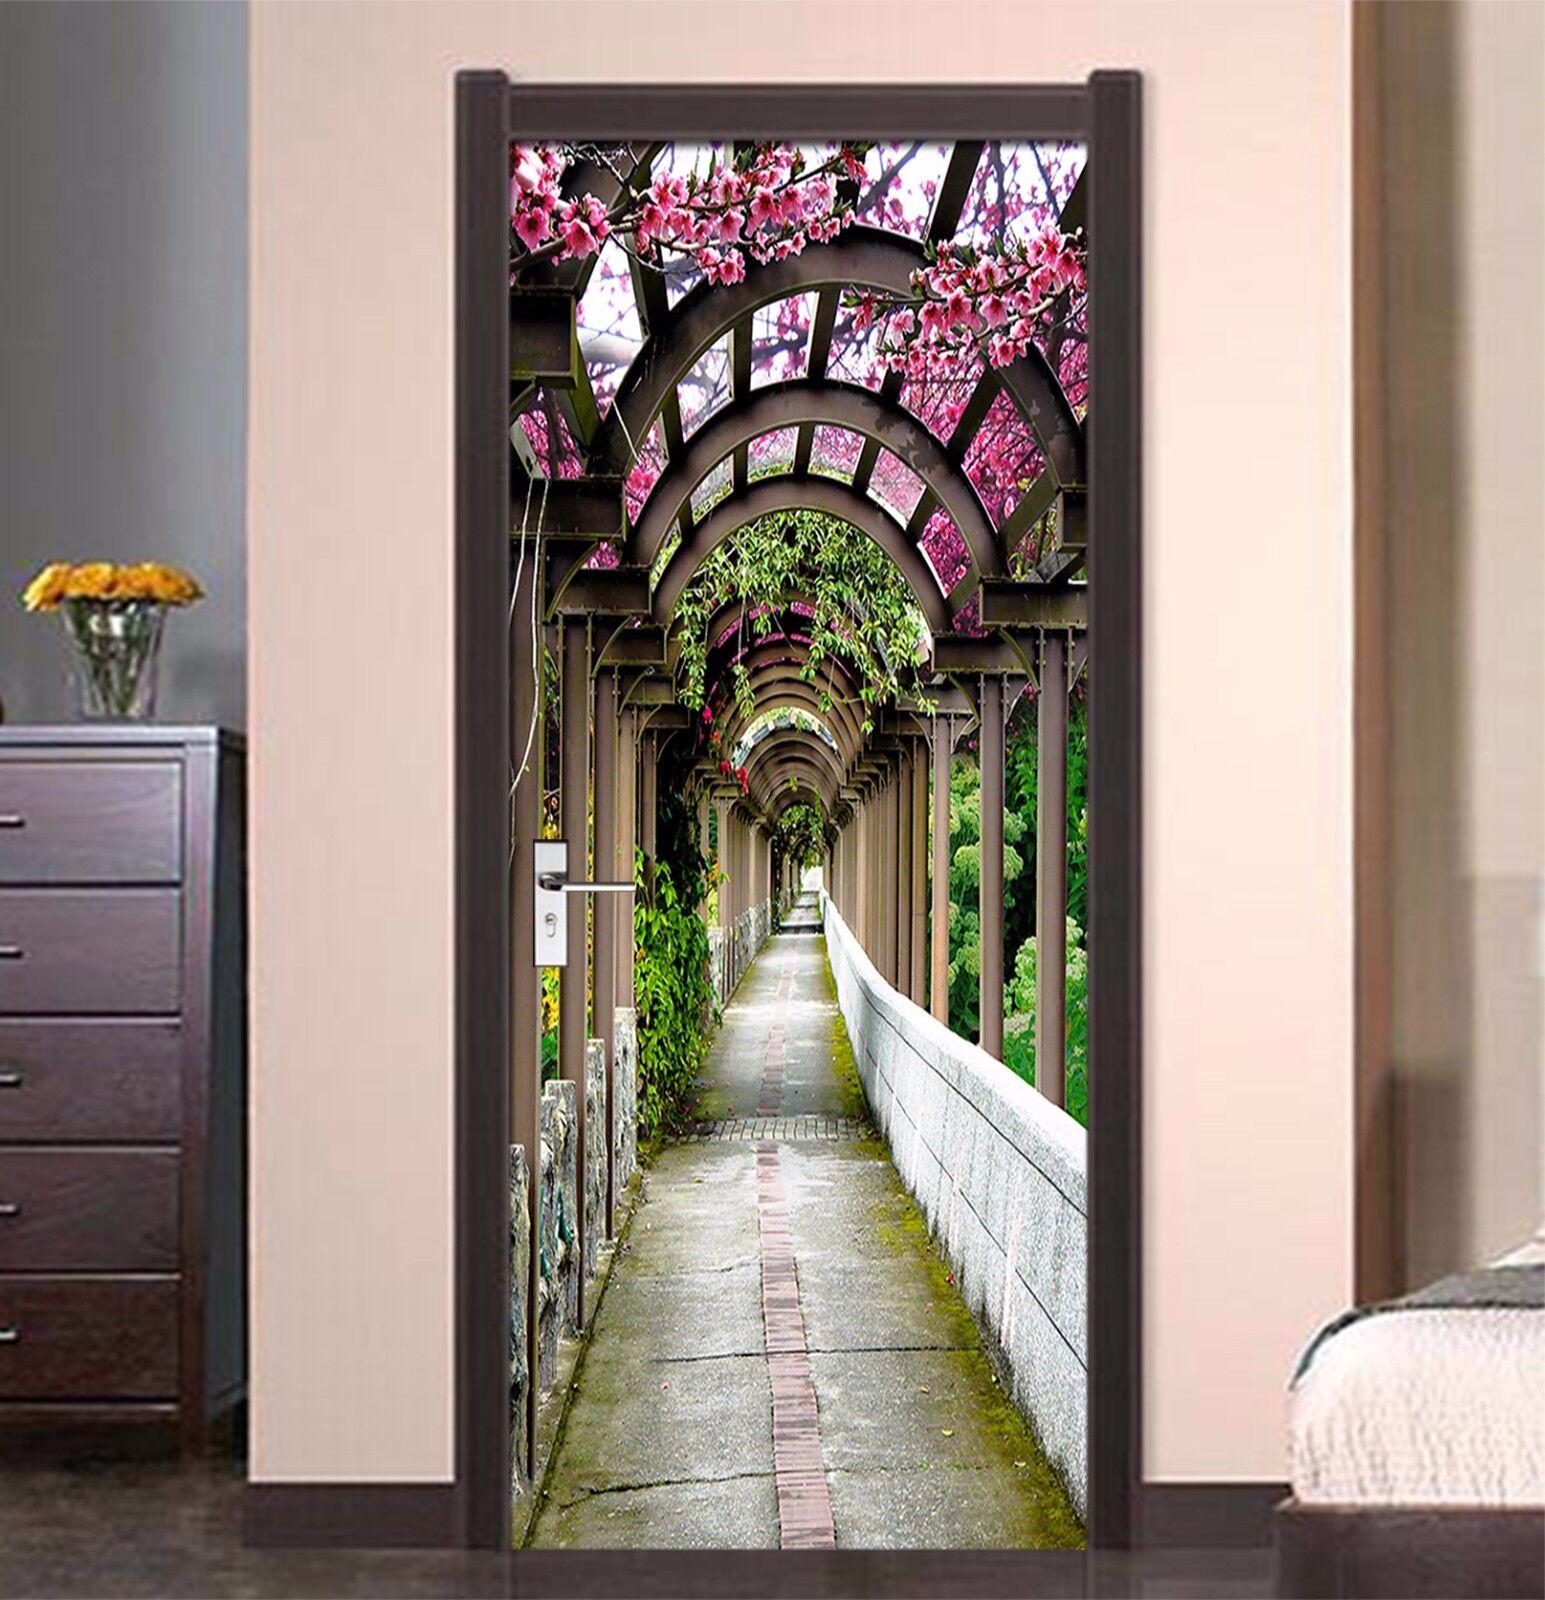 3D Bogen 752 Tür Wandmalerei Wandaufkleber Aufkleber AJ WALLPAPER DE Kyra